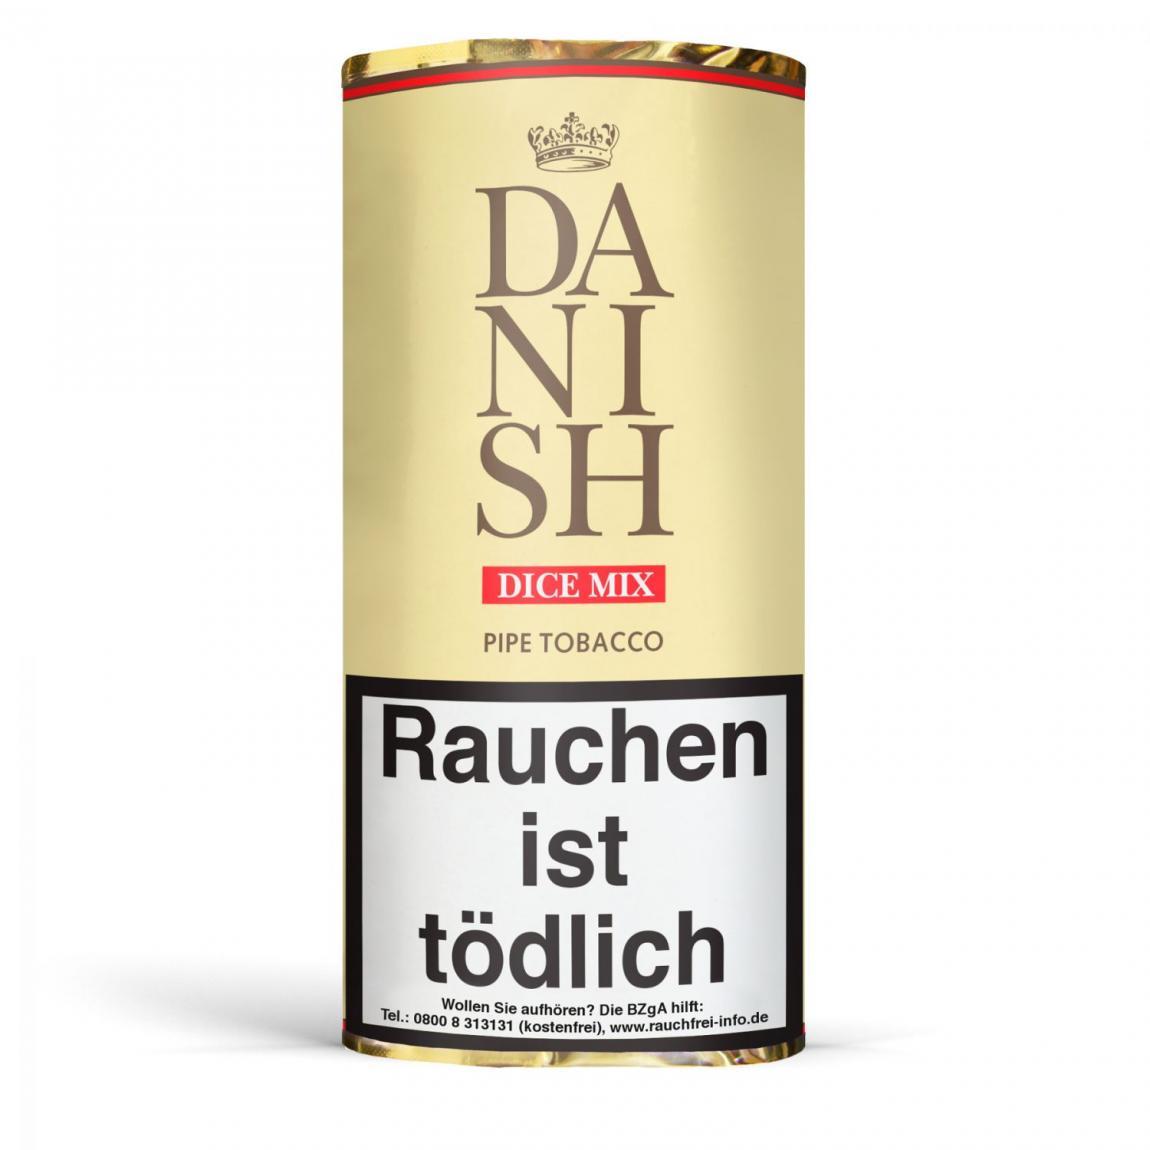 Danish Dice Mix 50g Pouch